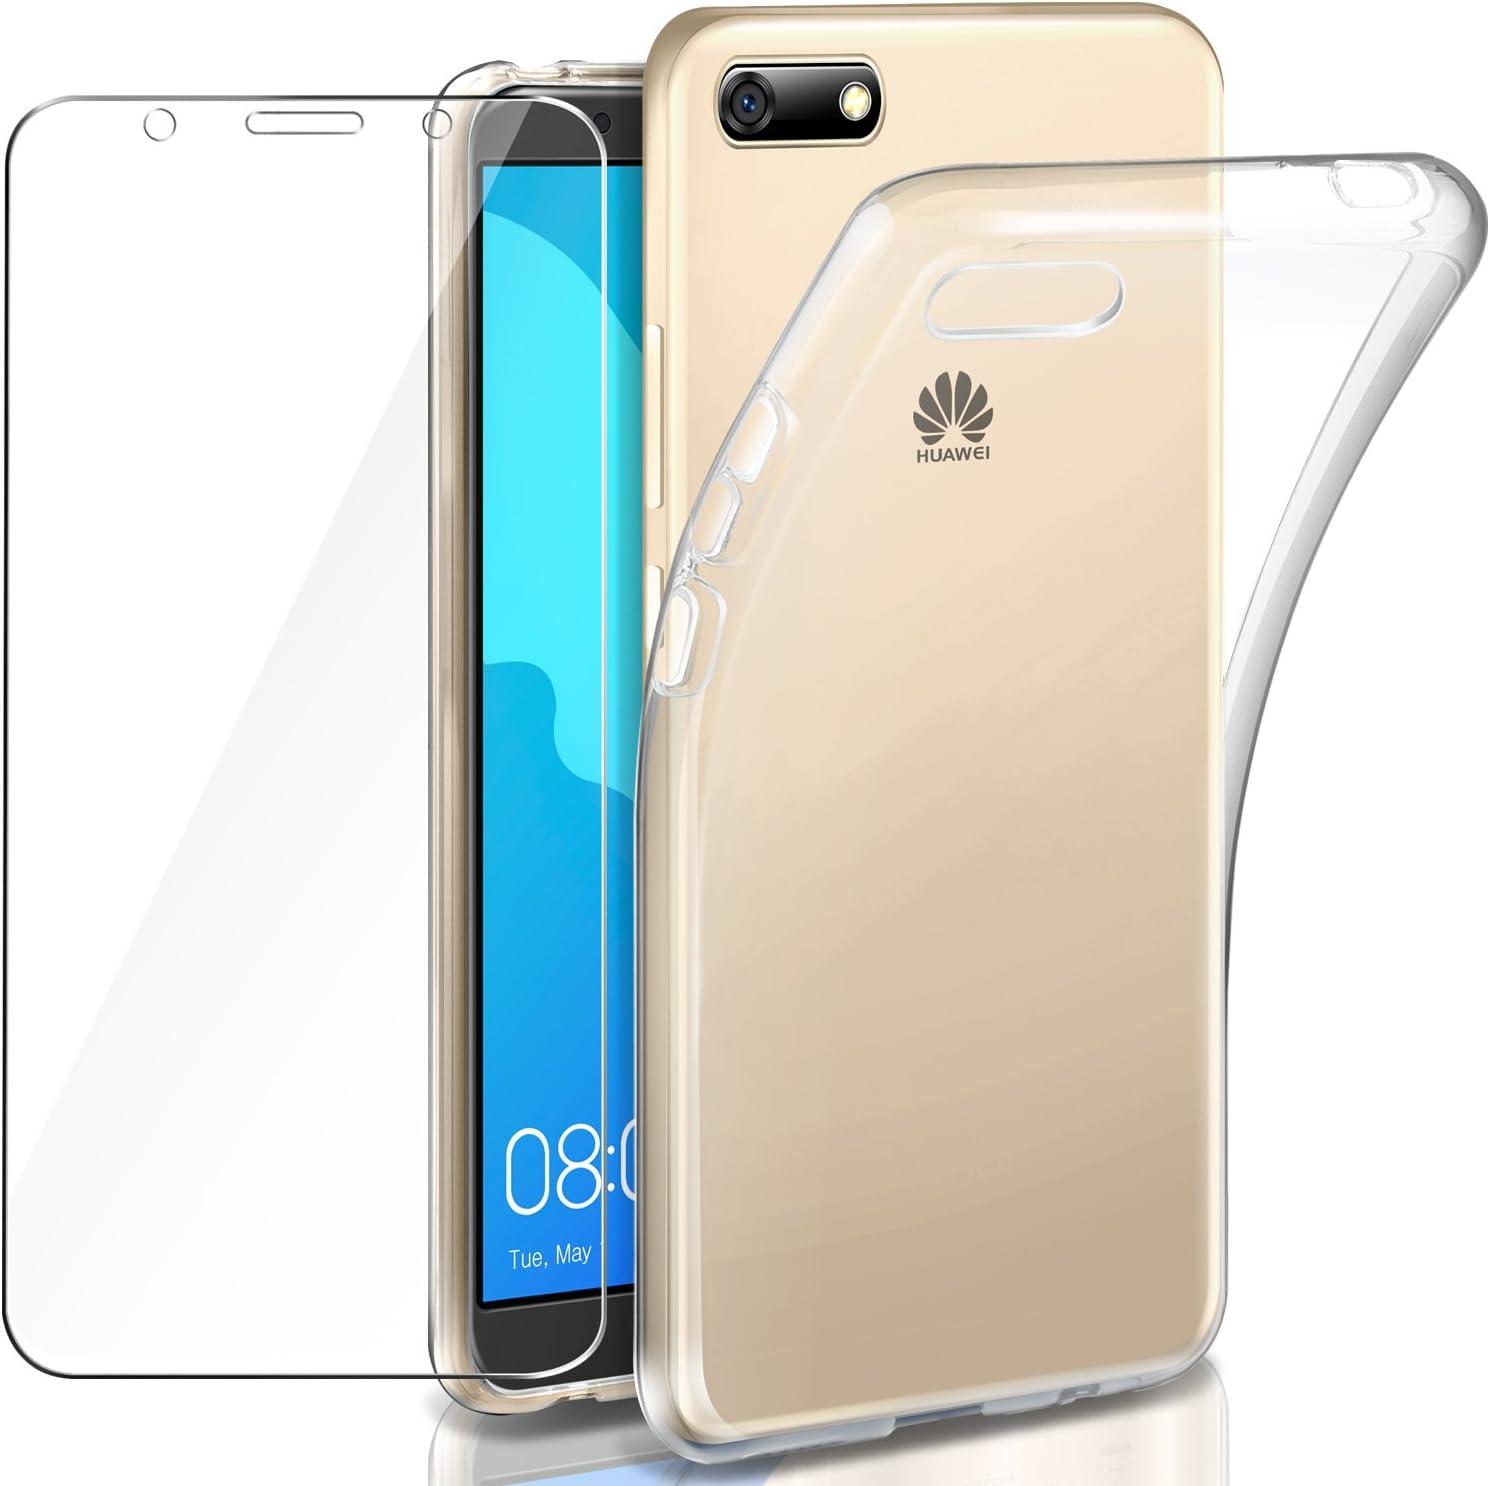 Telefonia AICEK Cover Huawei Y5 2018 5.45 Pollici Nero Custodia ...